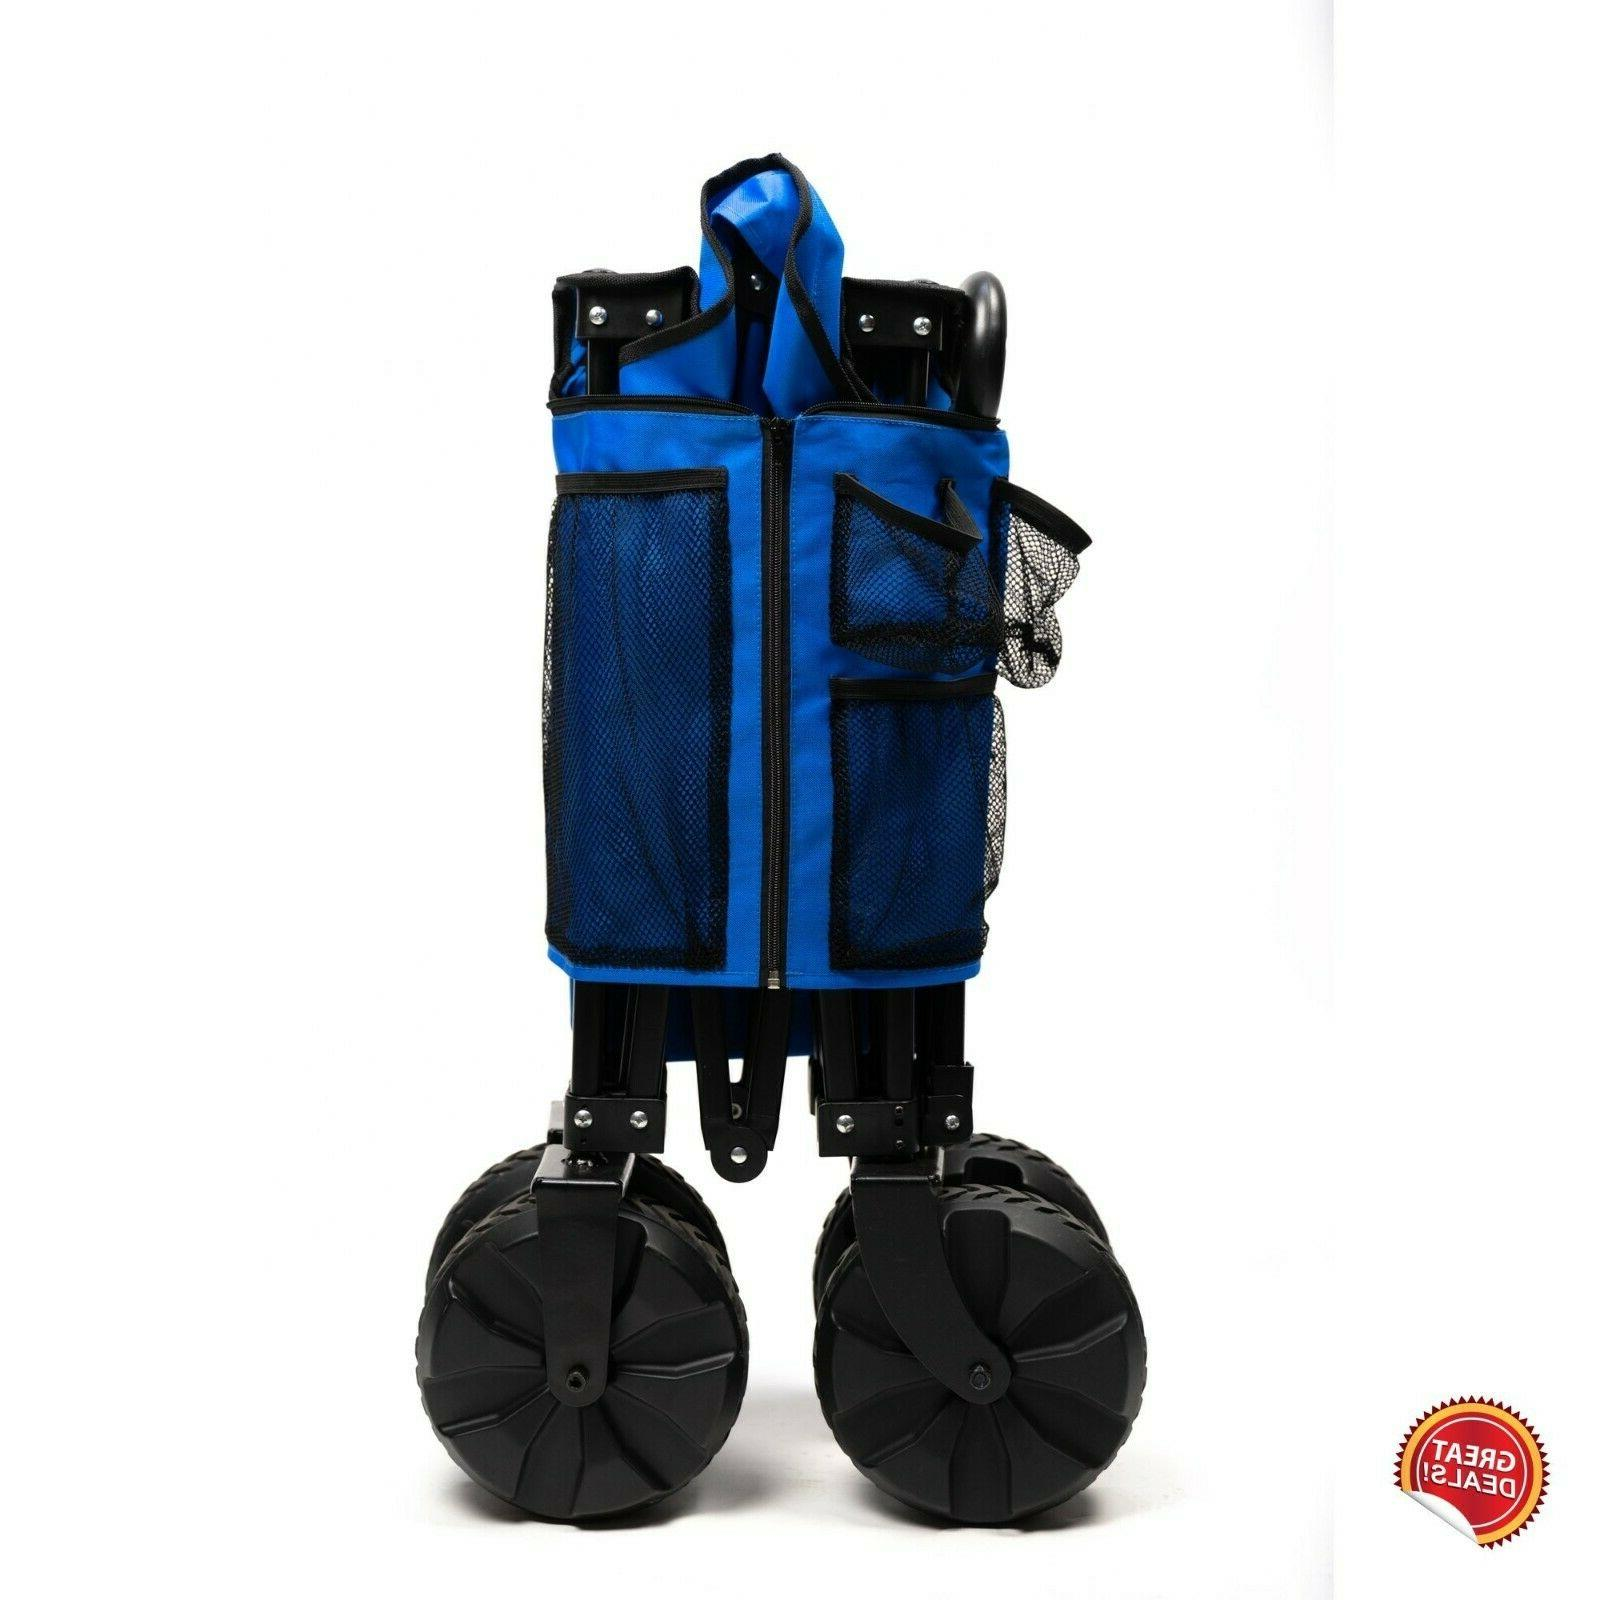 Folding Wagon Cart Sports Utility Duty Large Wheels